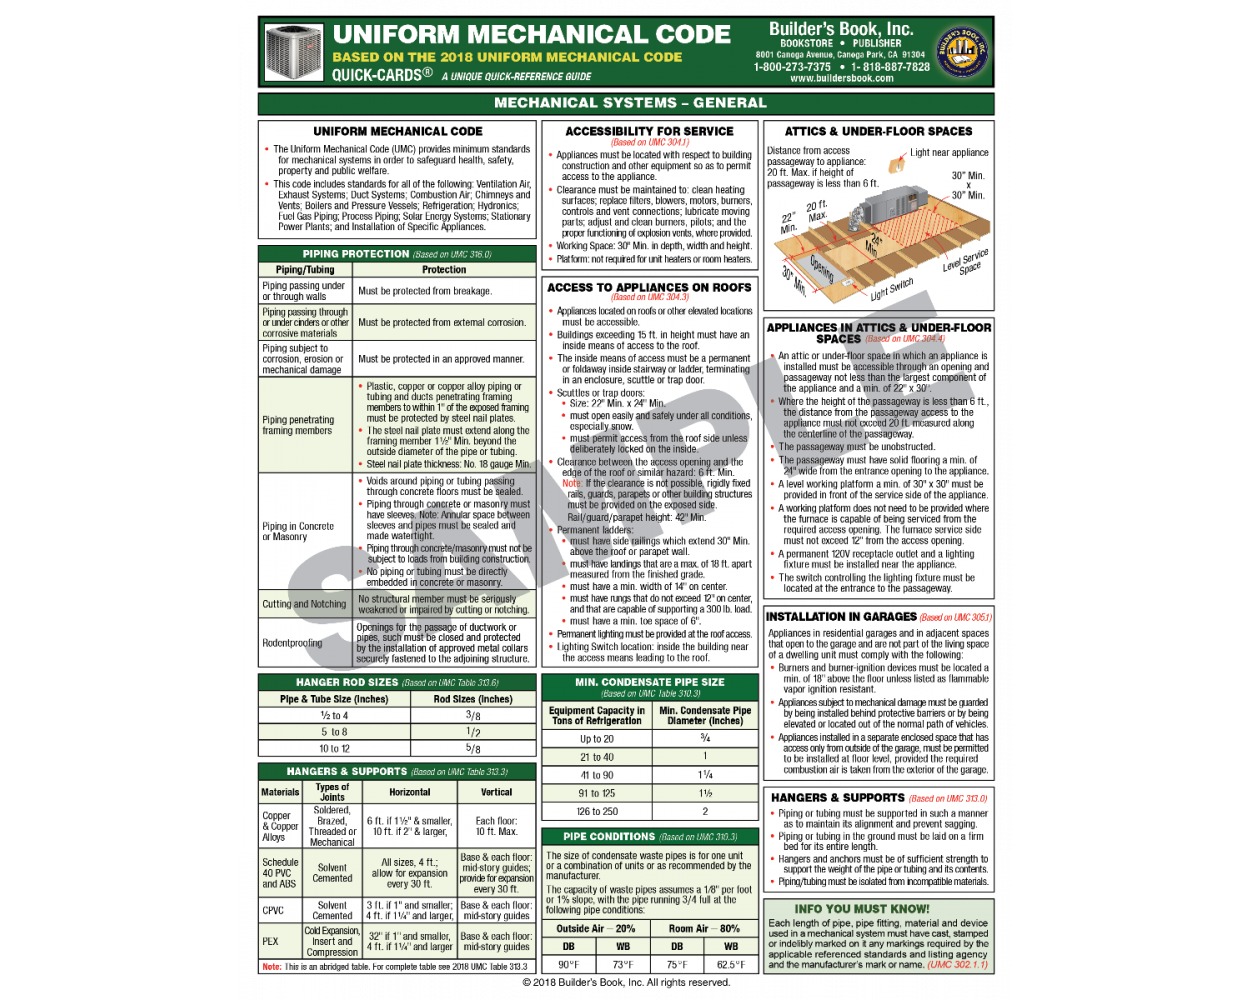 2018 Uniform Mechanical Code